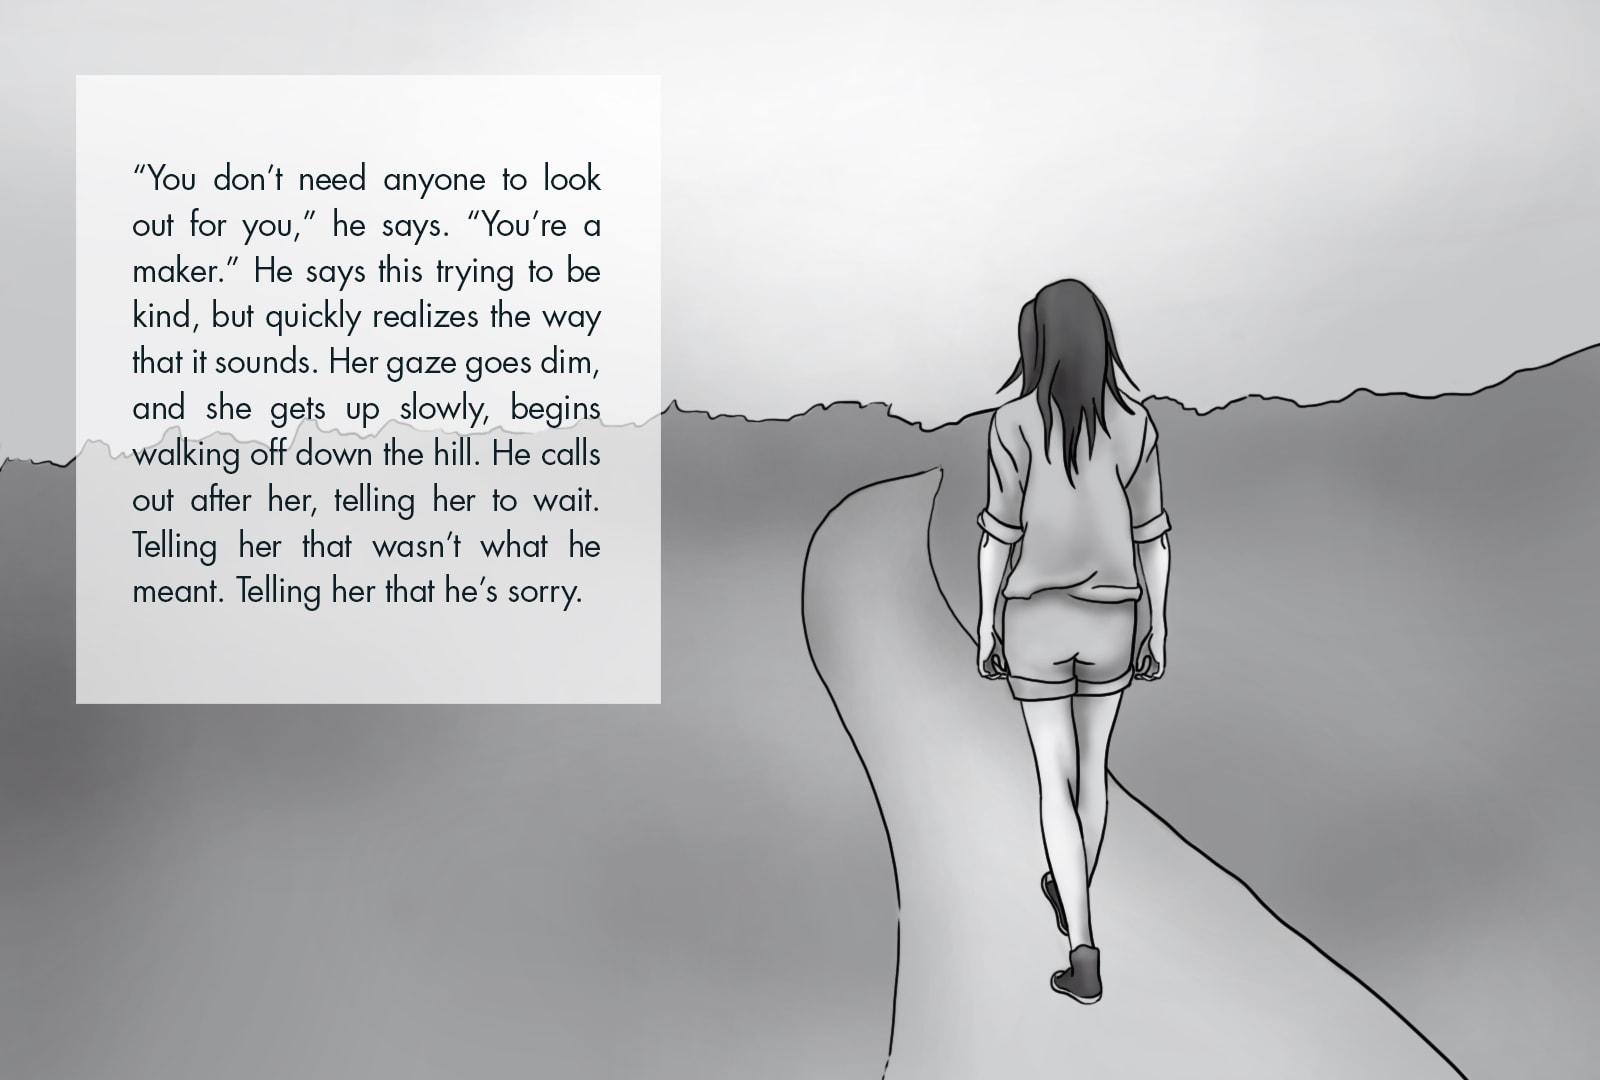 Monthly Fiction Maker illustration illustraded story Seth Marlin Alyssa Cooper page 19